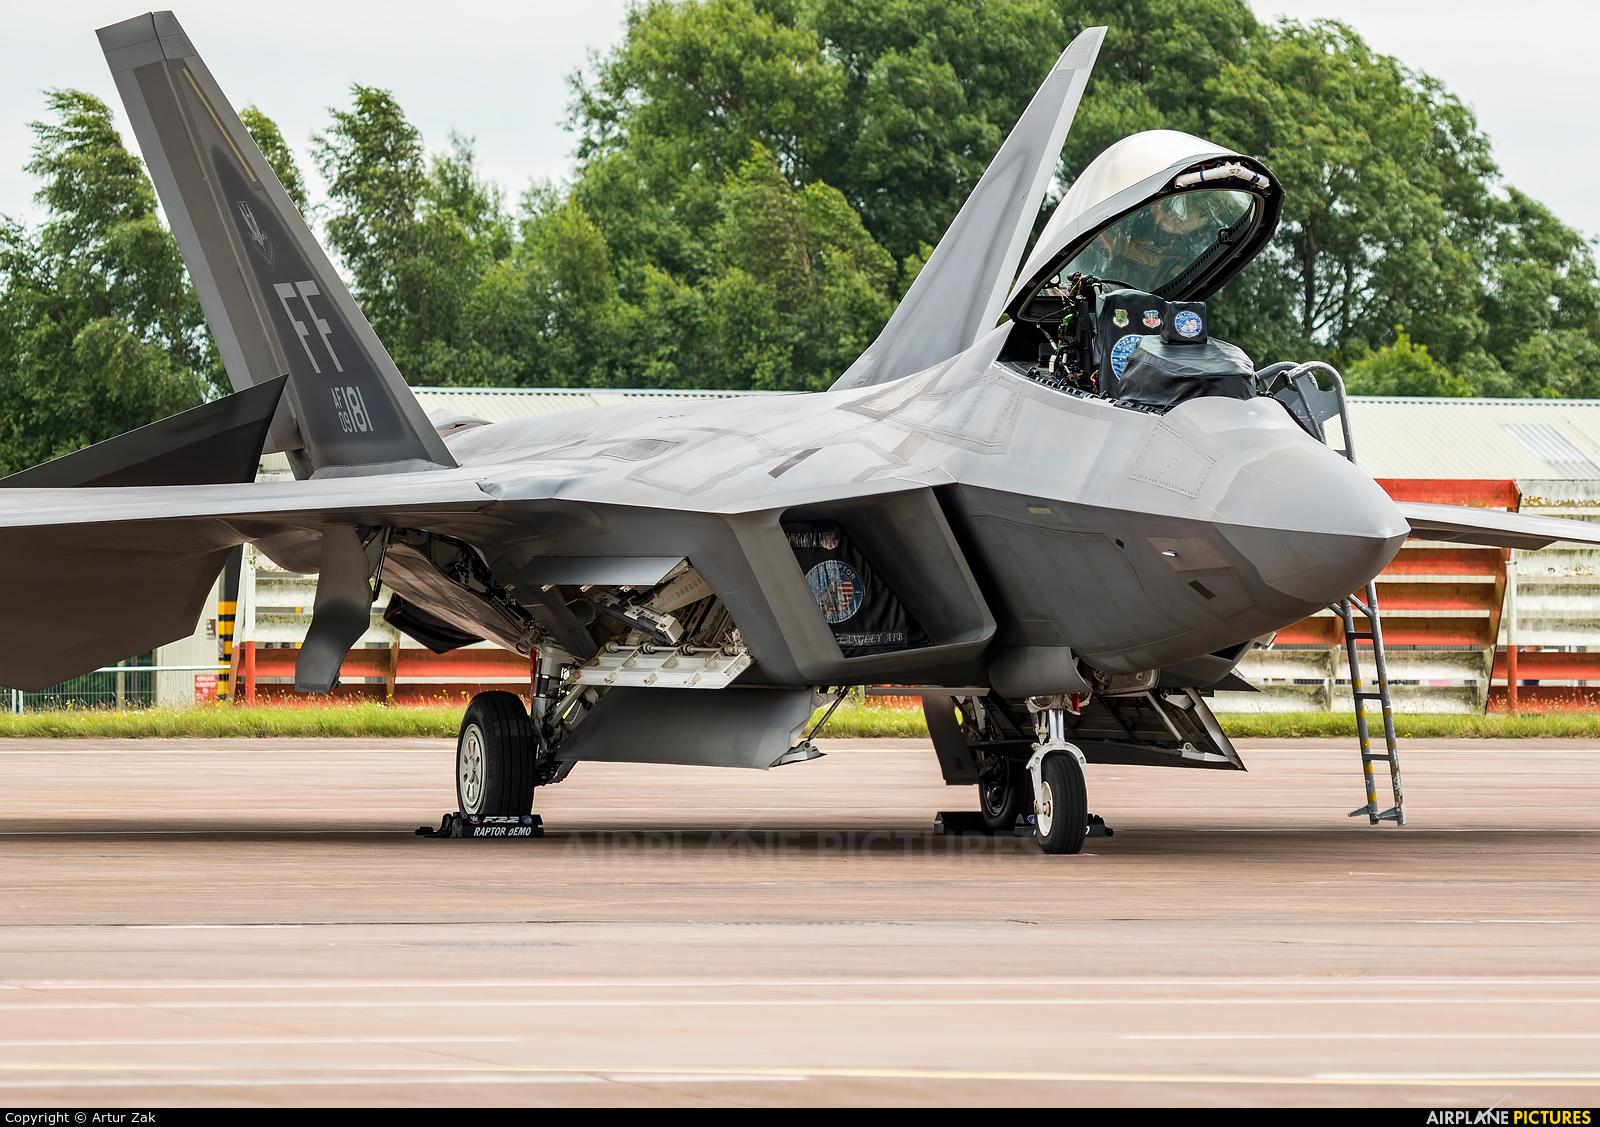 USA - Air Force 09-4181 aircraft at Fairford